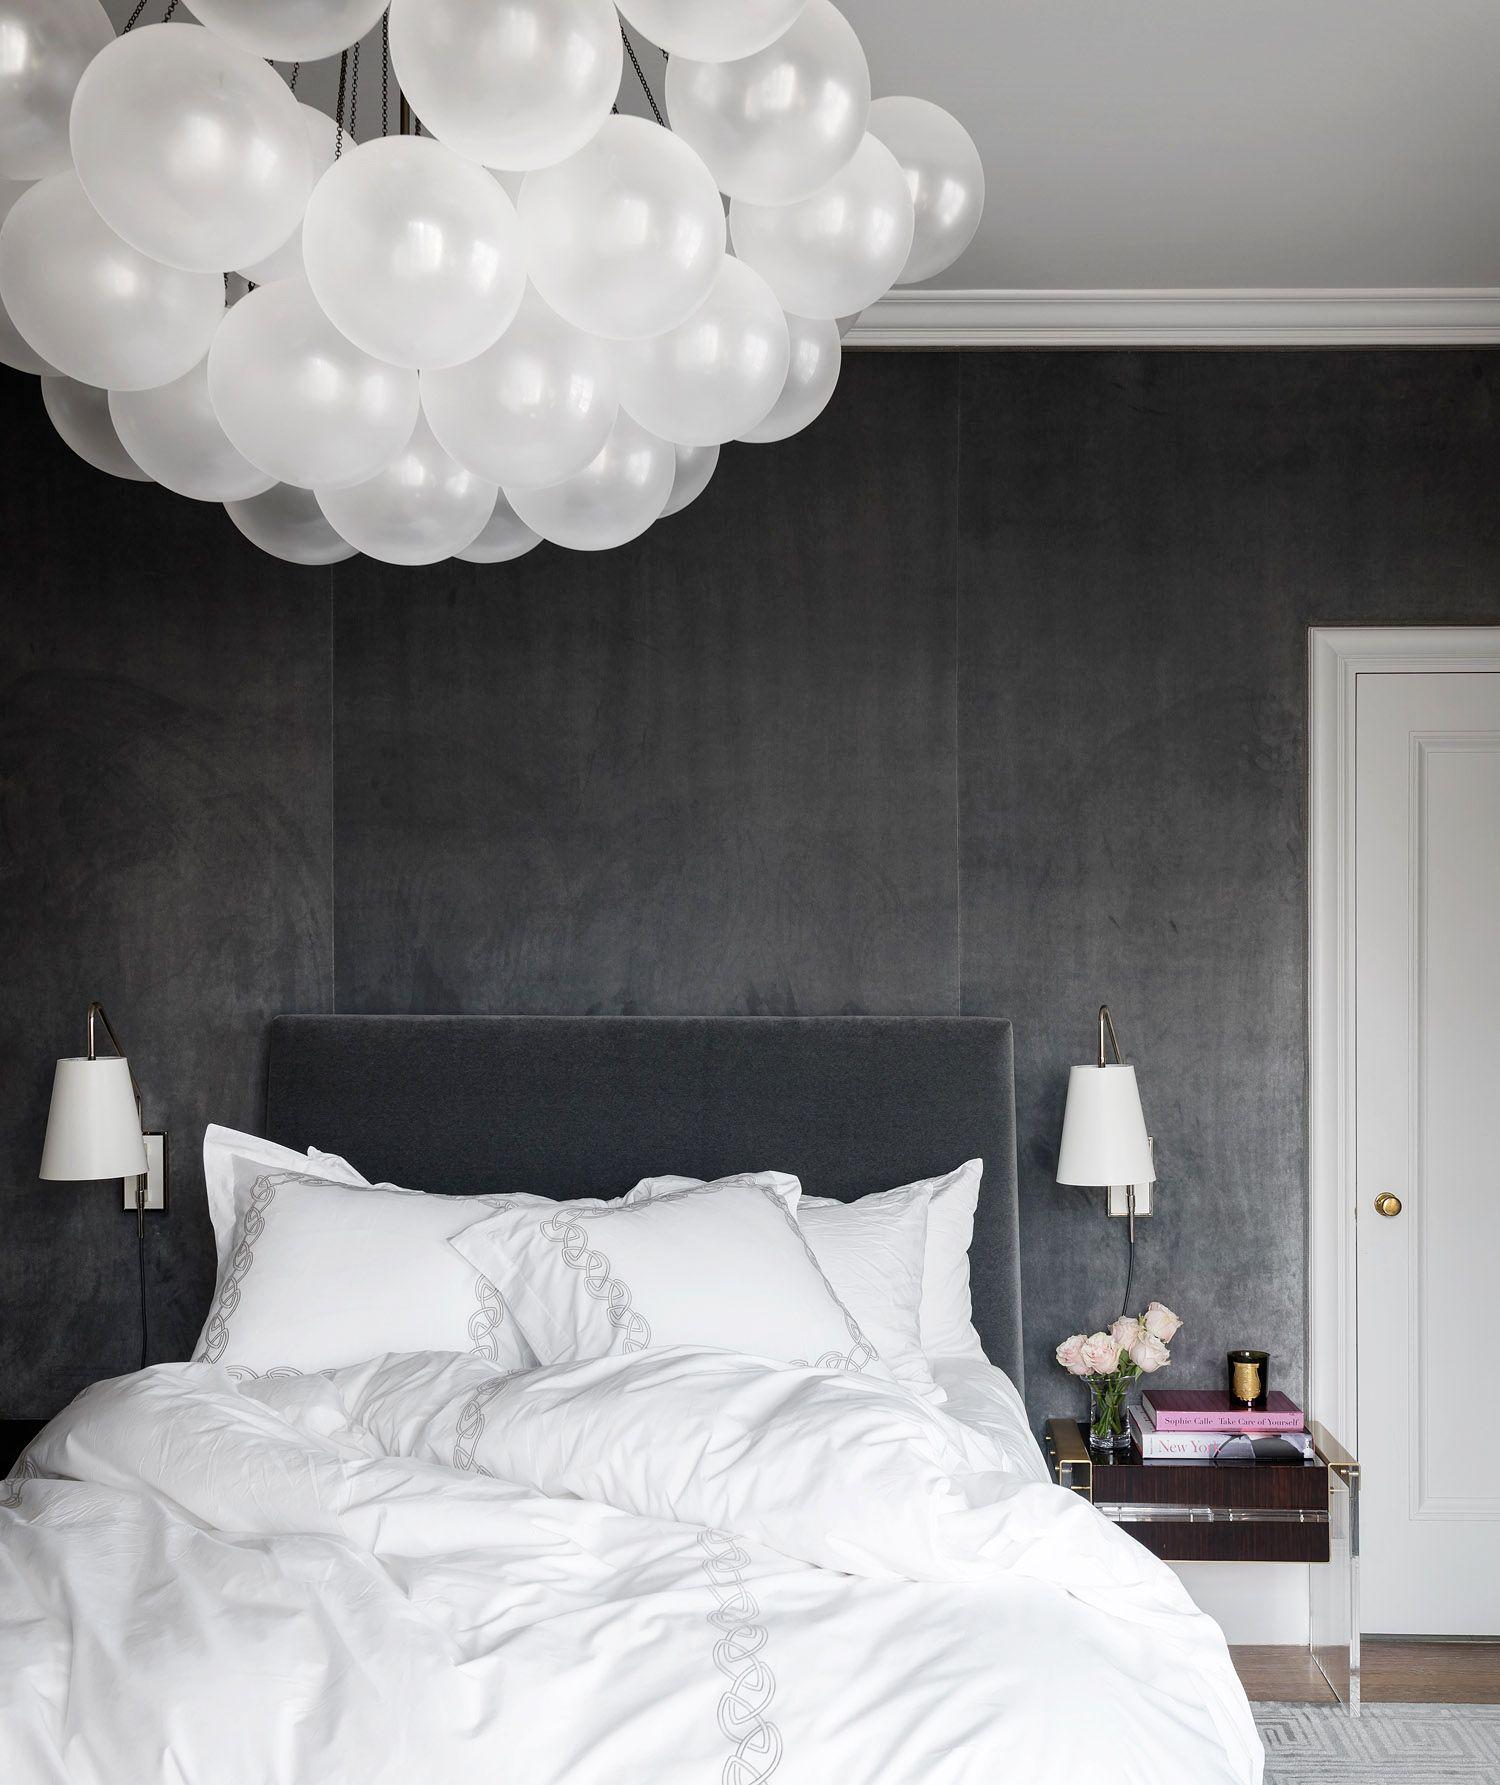 Create your own jungle hideaway. 19 Best Bedroom Wall Decor Ideas in 2021 - Bedroom Wall